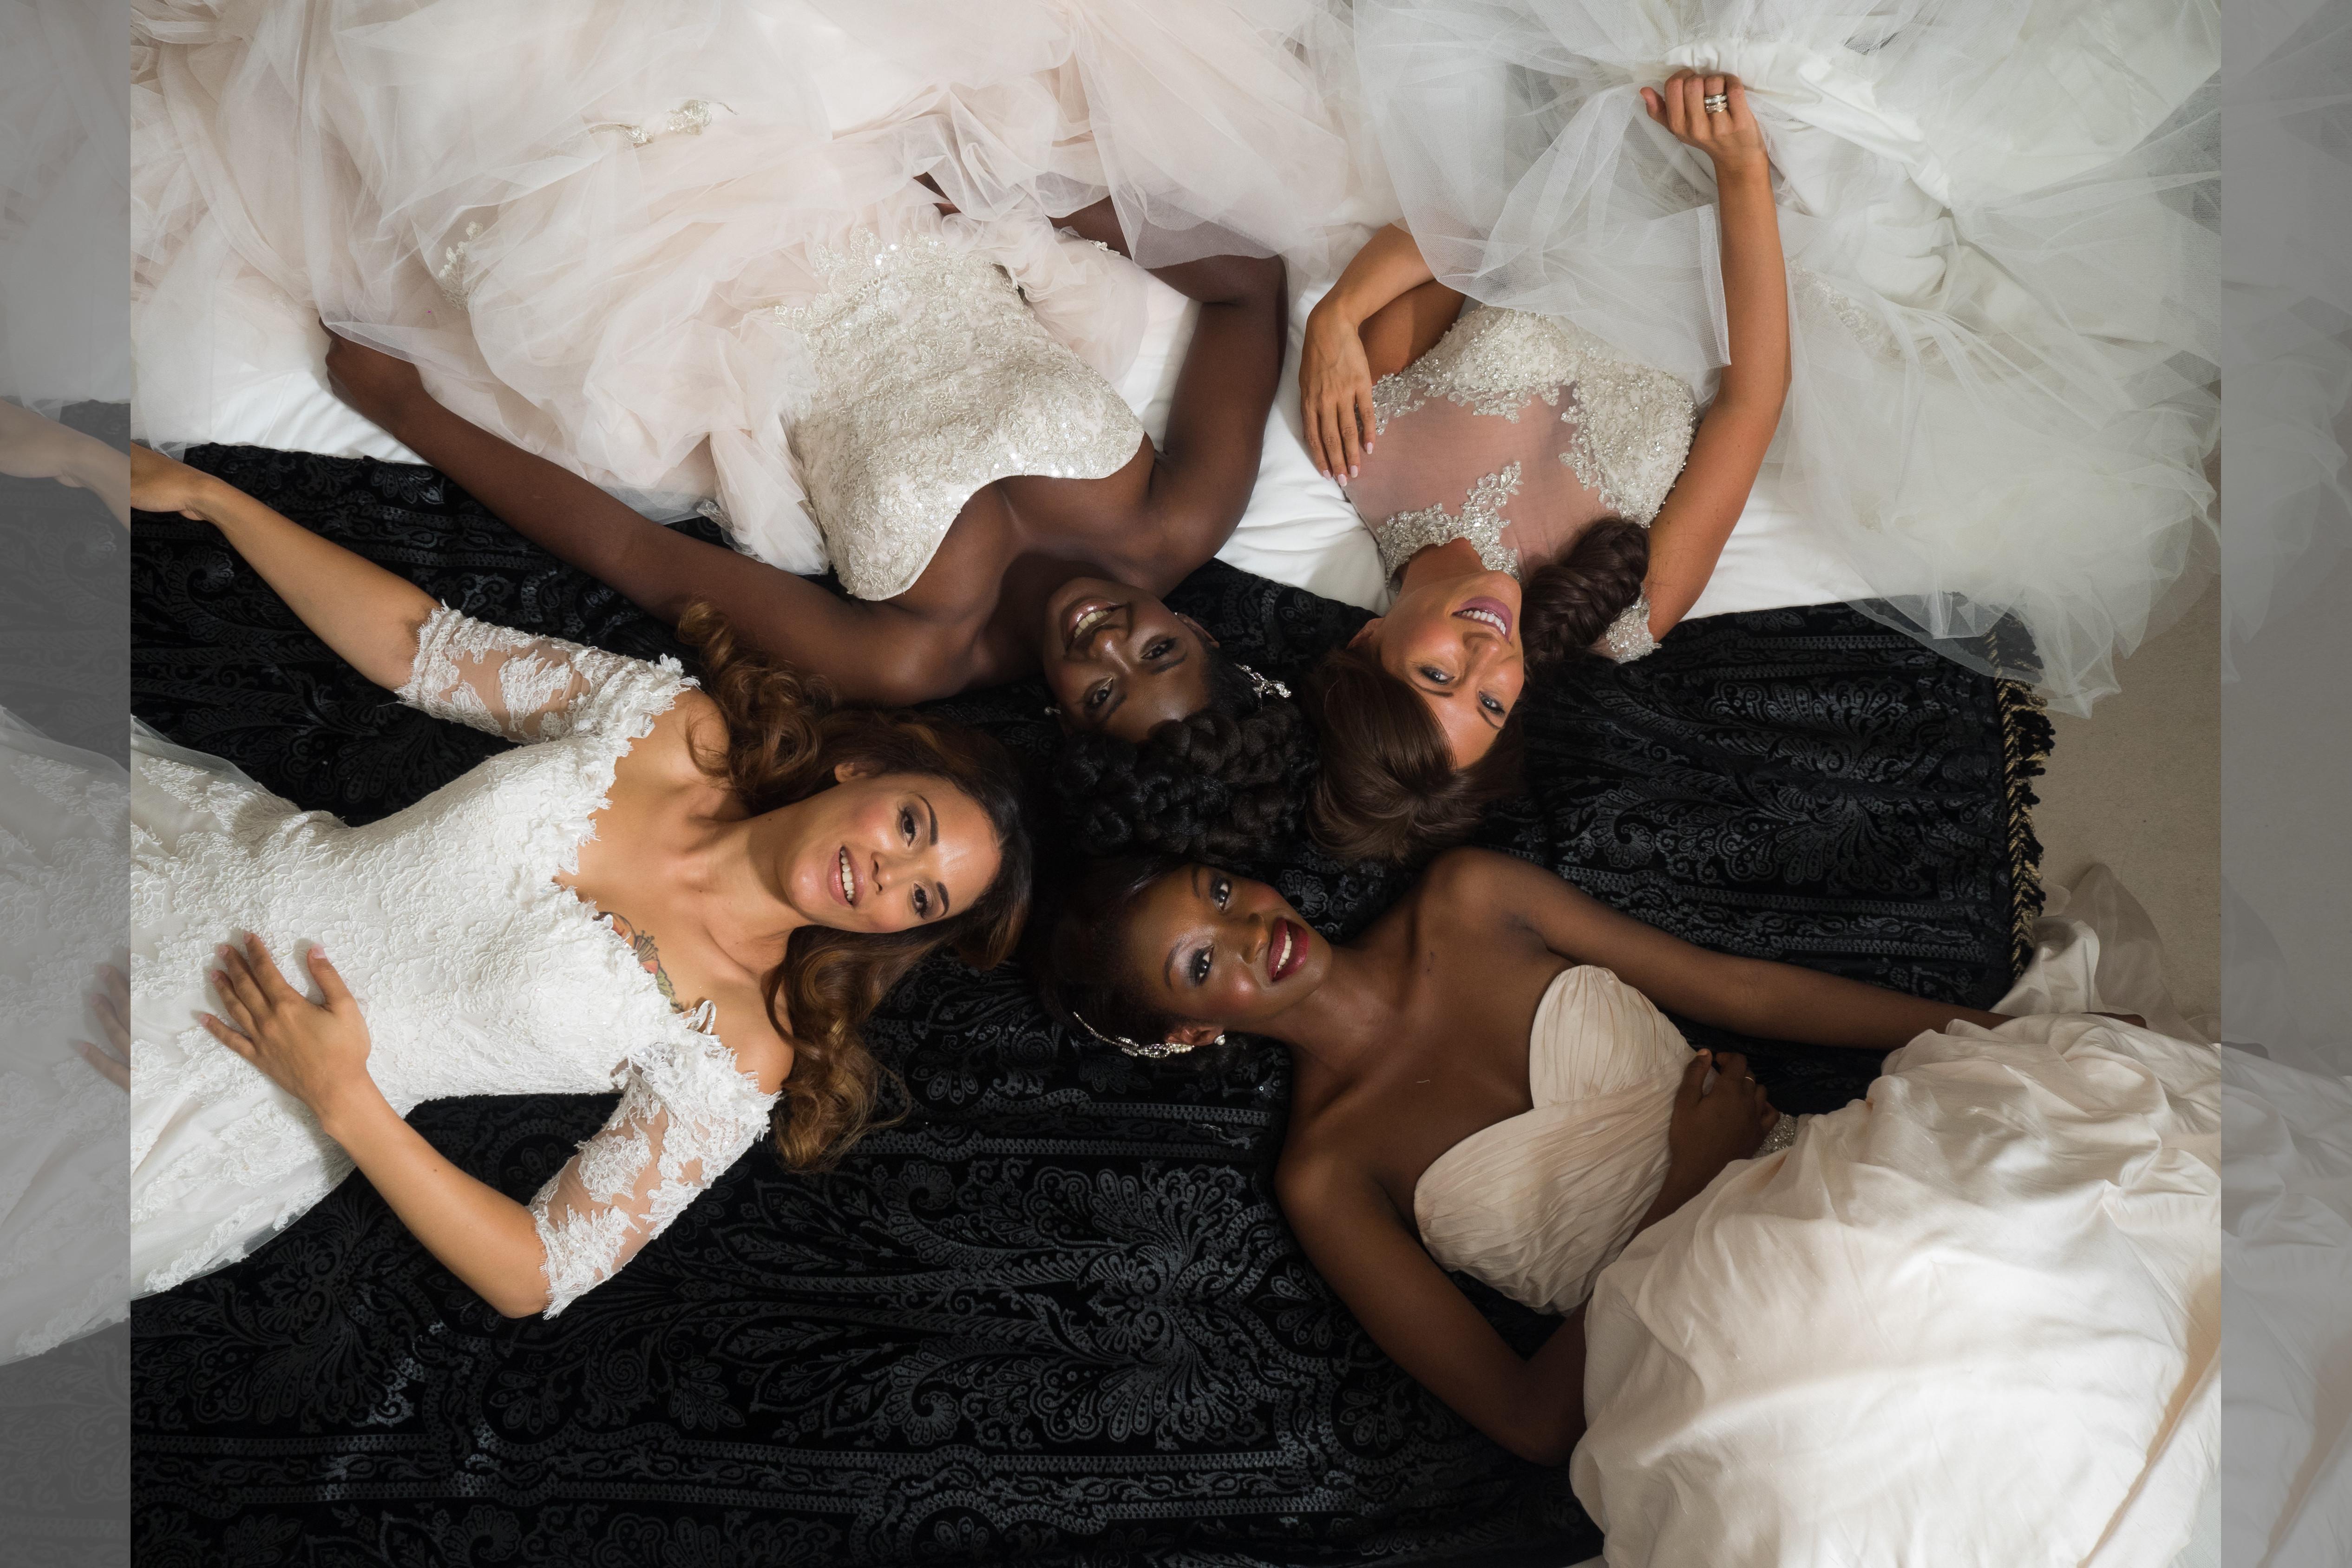 Bridebook.co.uk brides of all skin tones